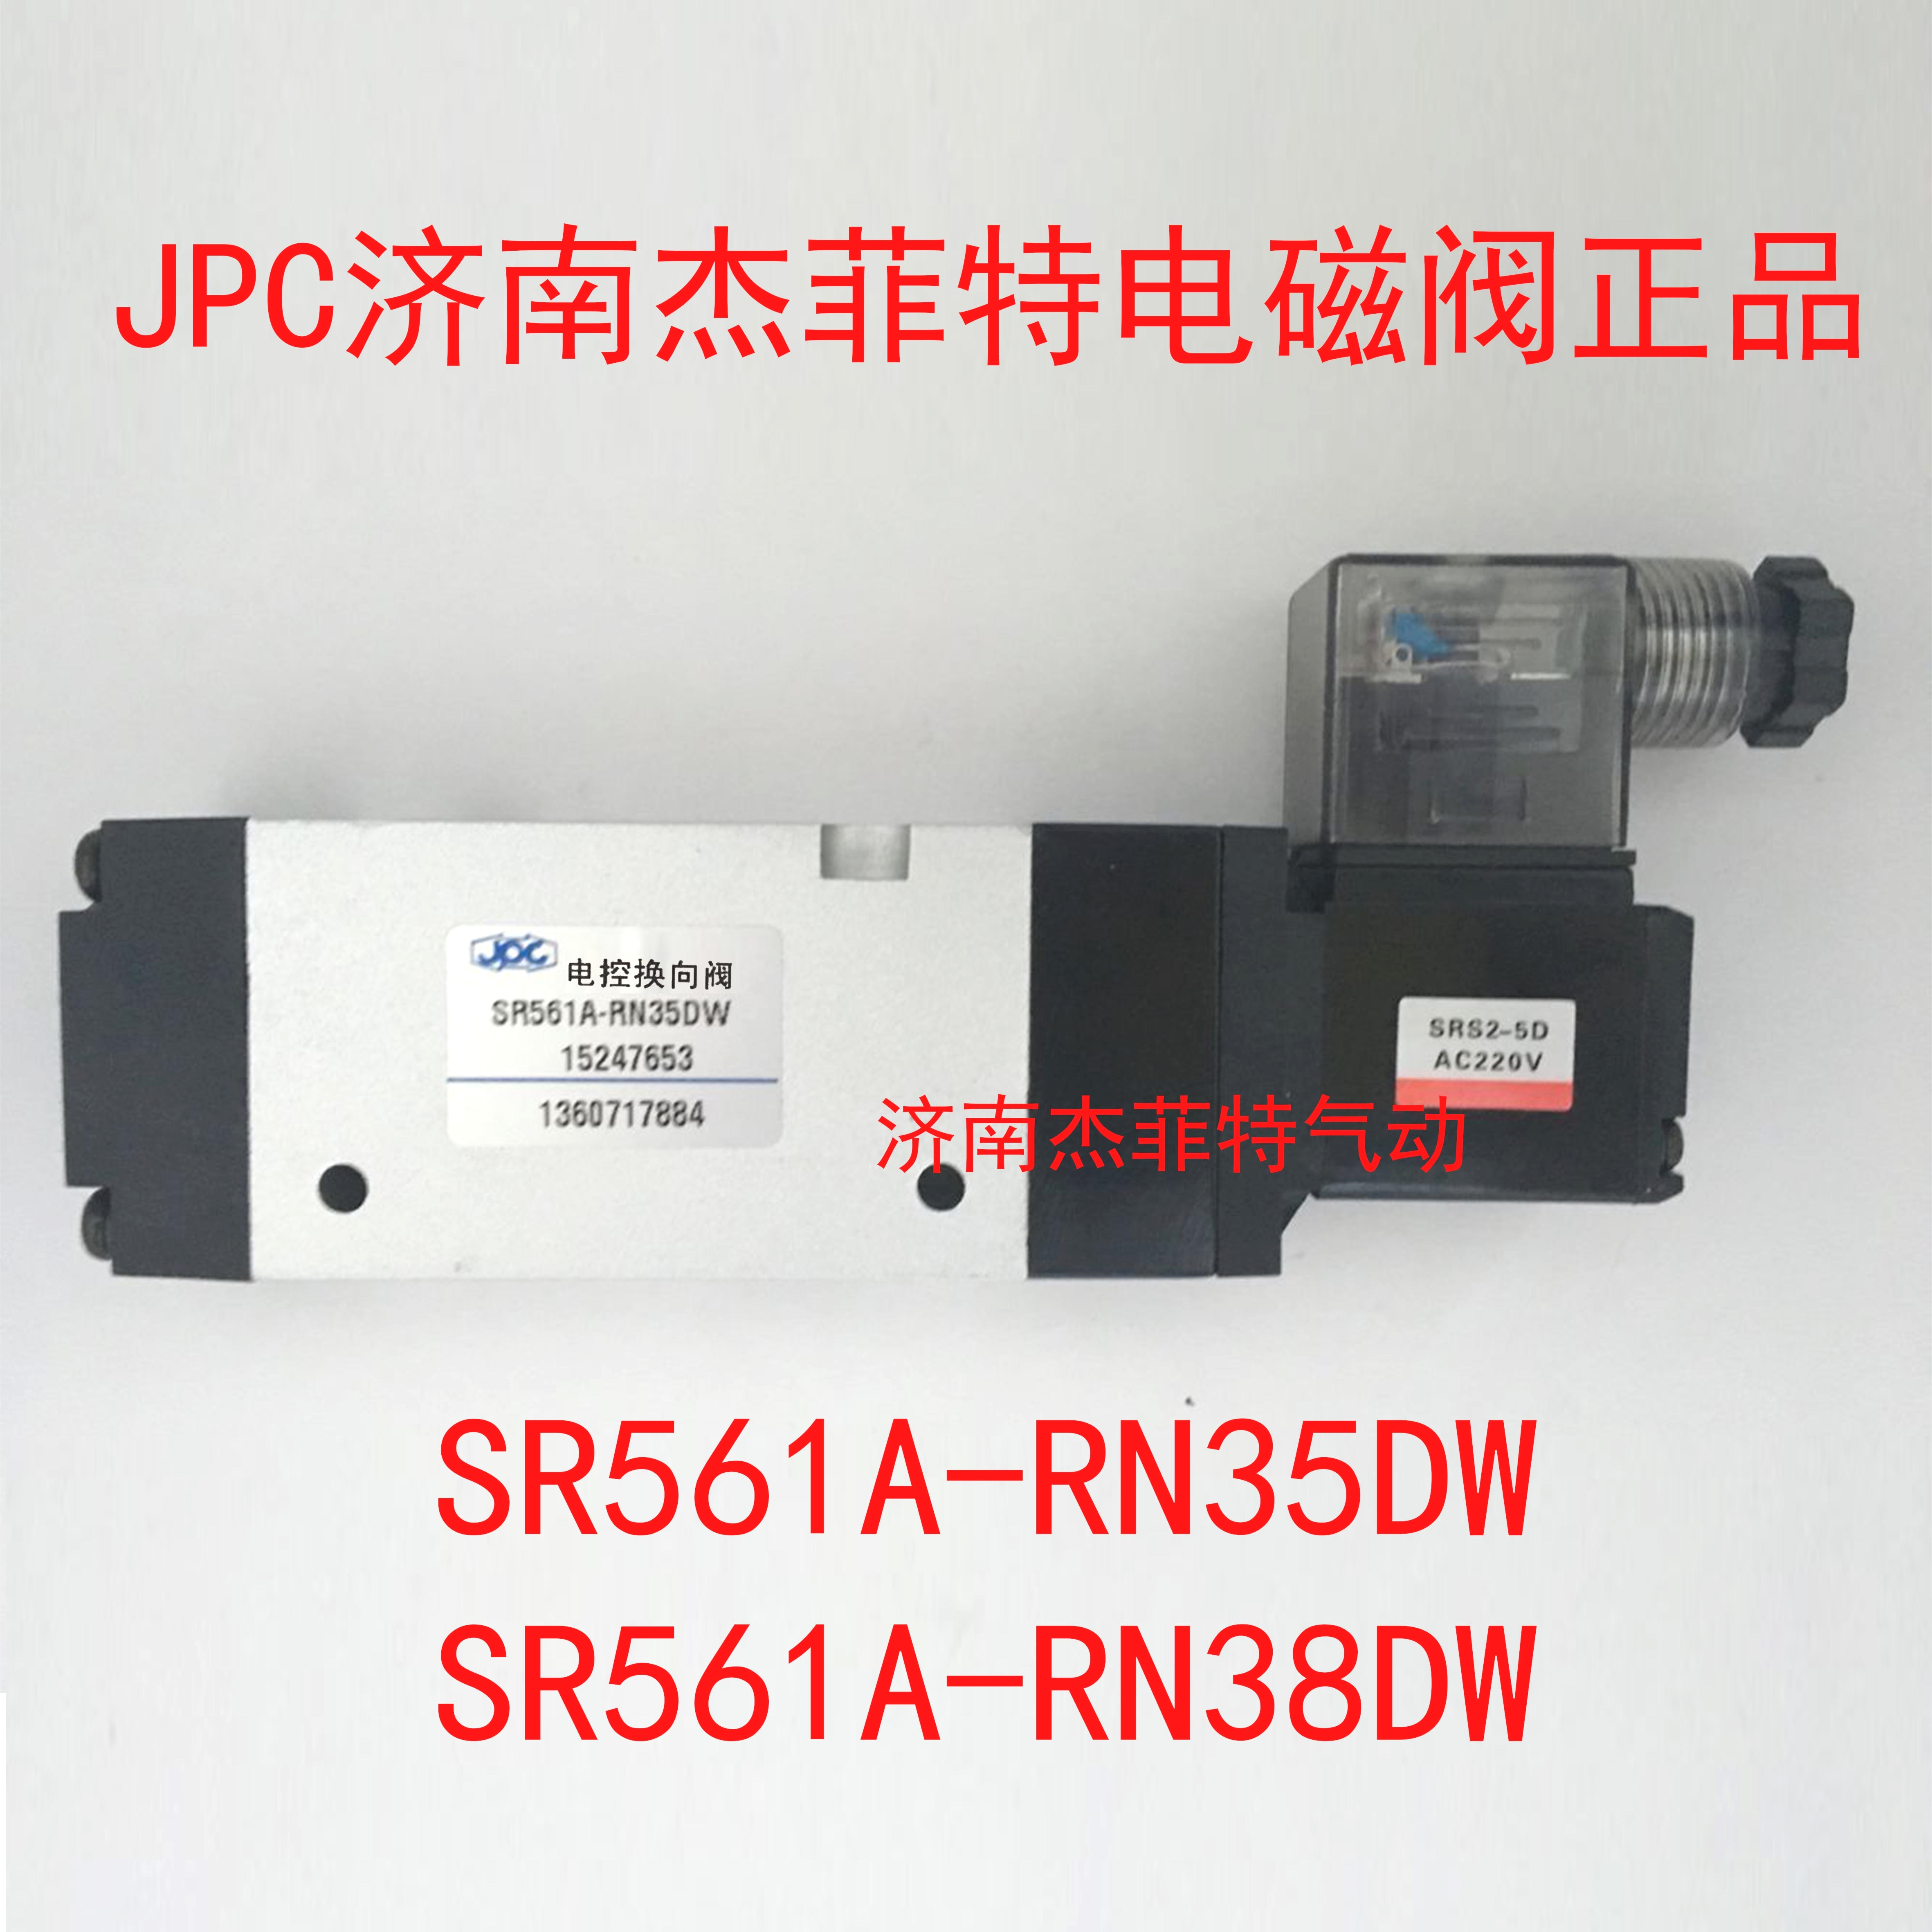 SR561A-RN35DWSR561A-RN38DW электронные клапанов Аутентичные Джей